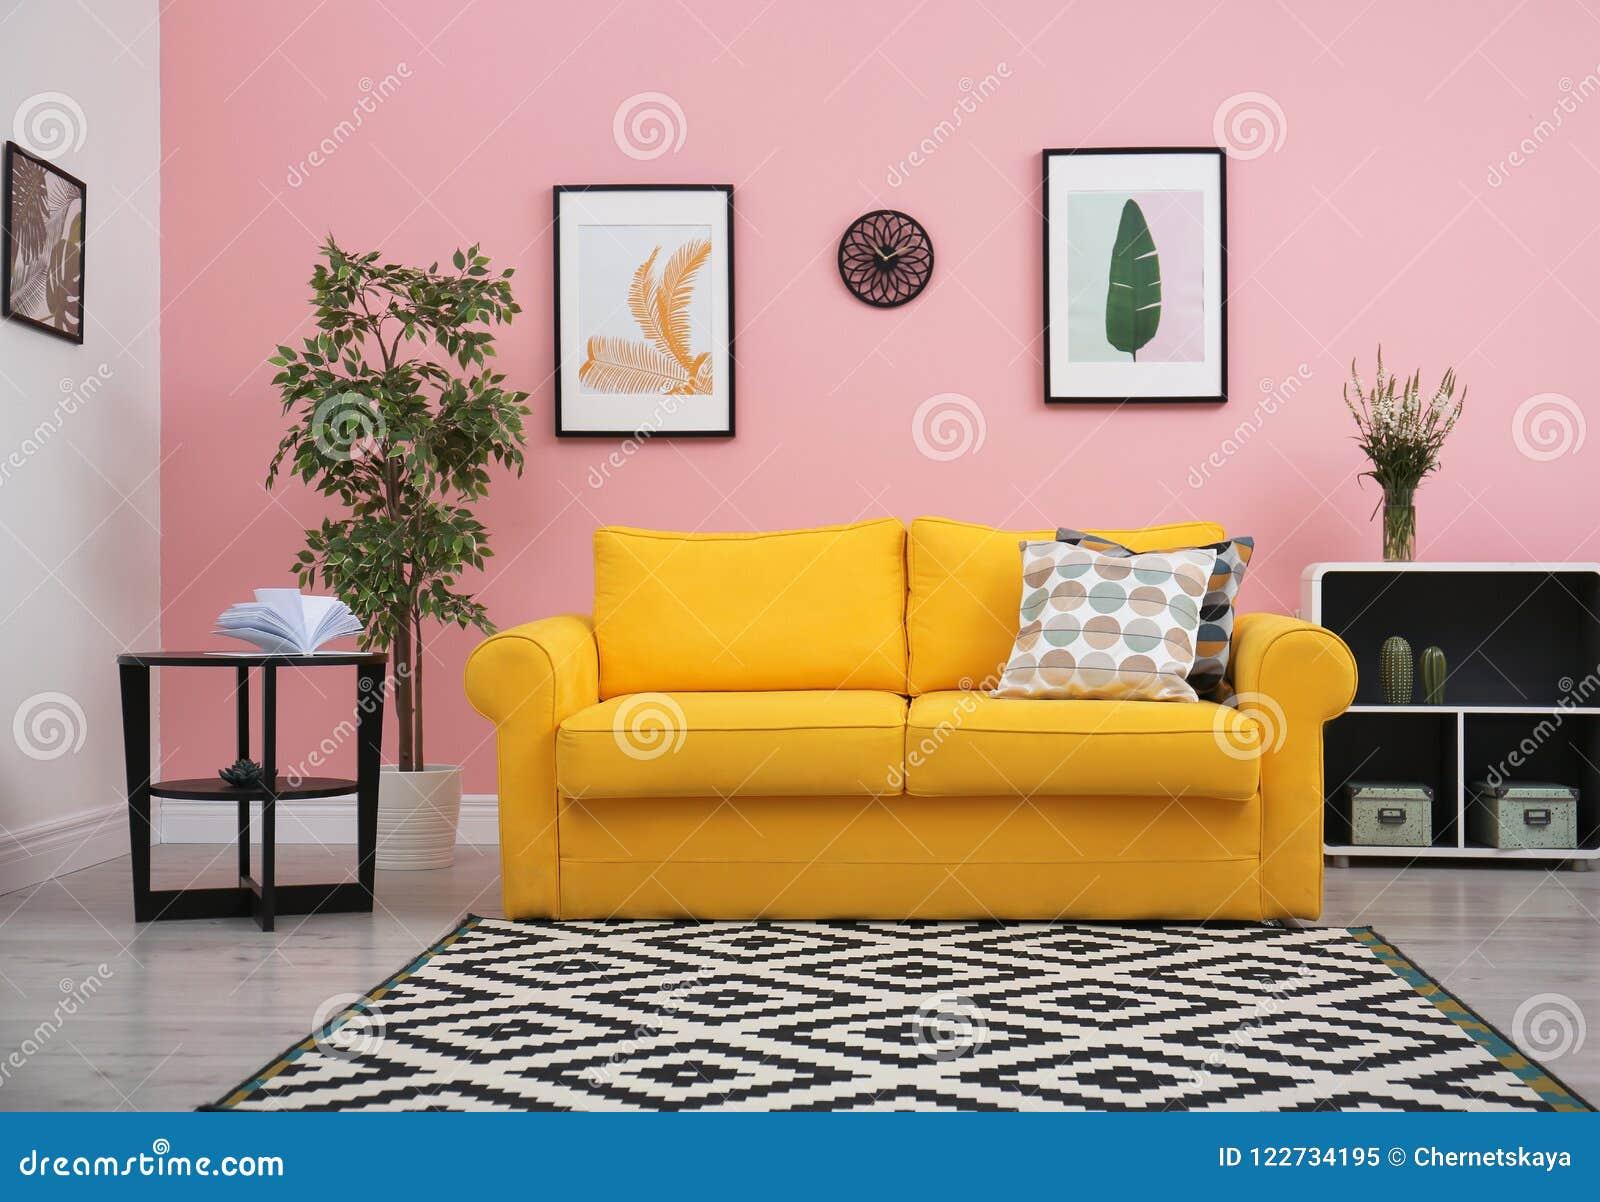 modern living room interior with comfortable yellow sofa